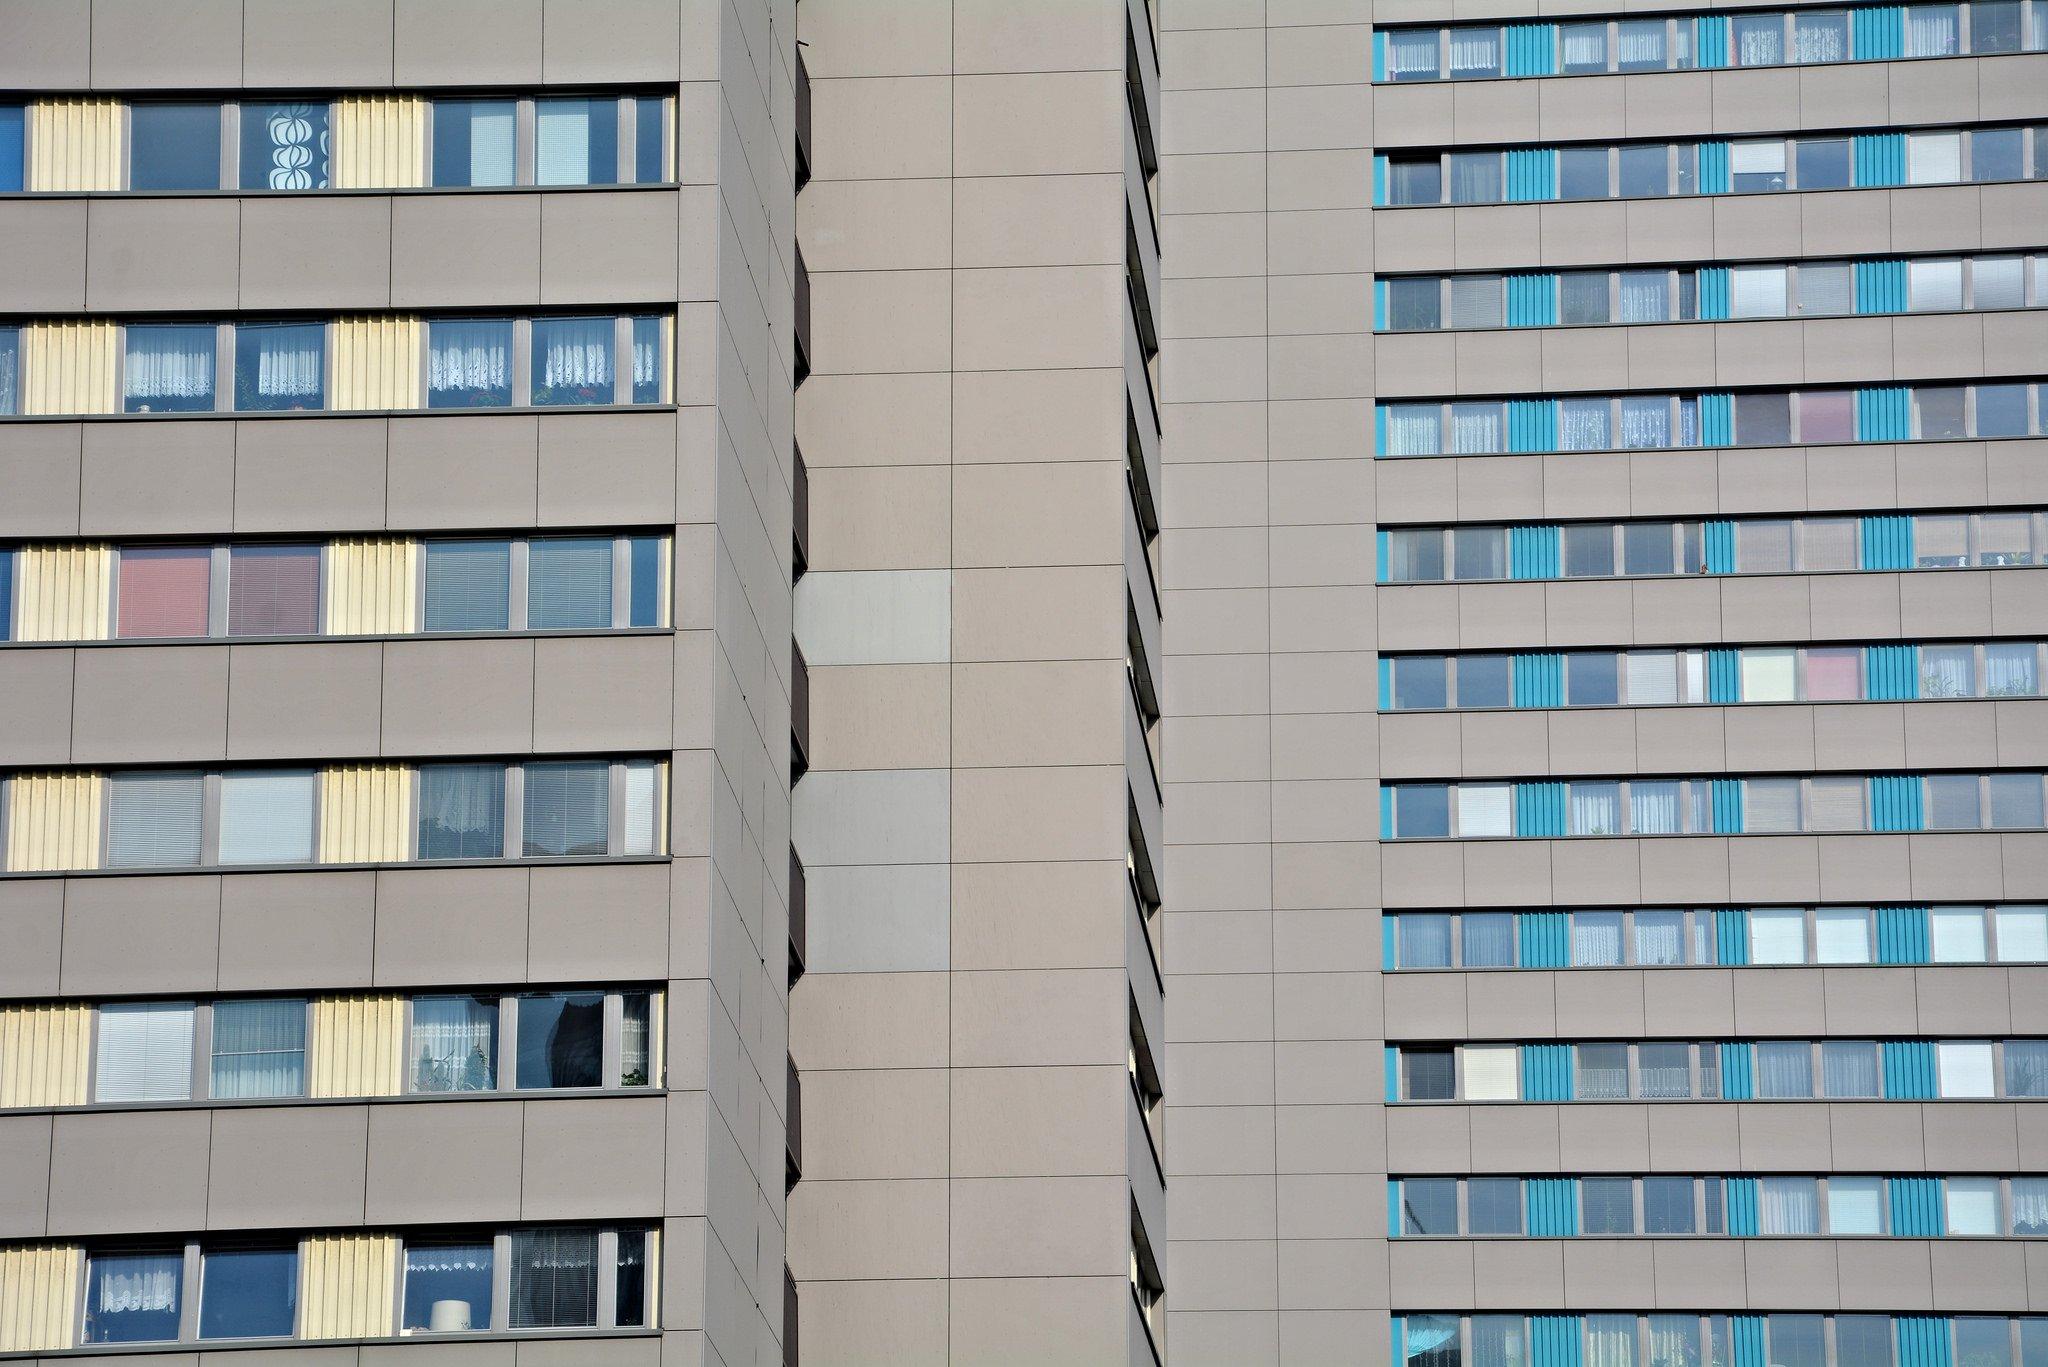 plattenbauten leipziger strasse berlin